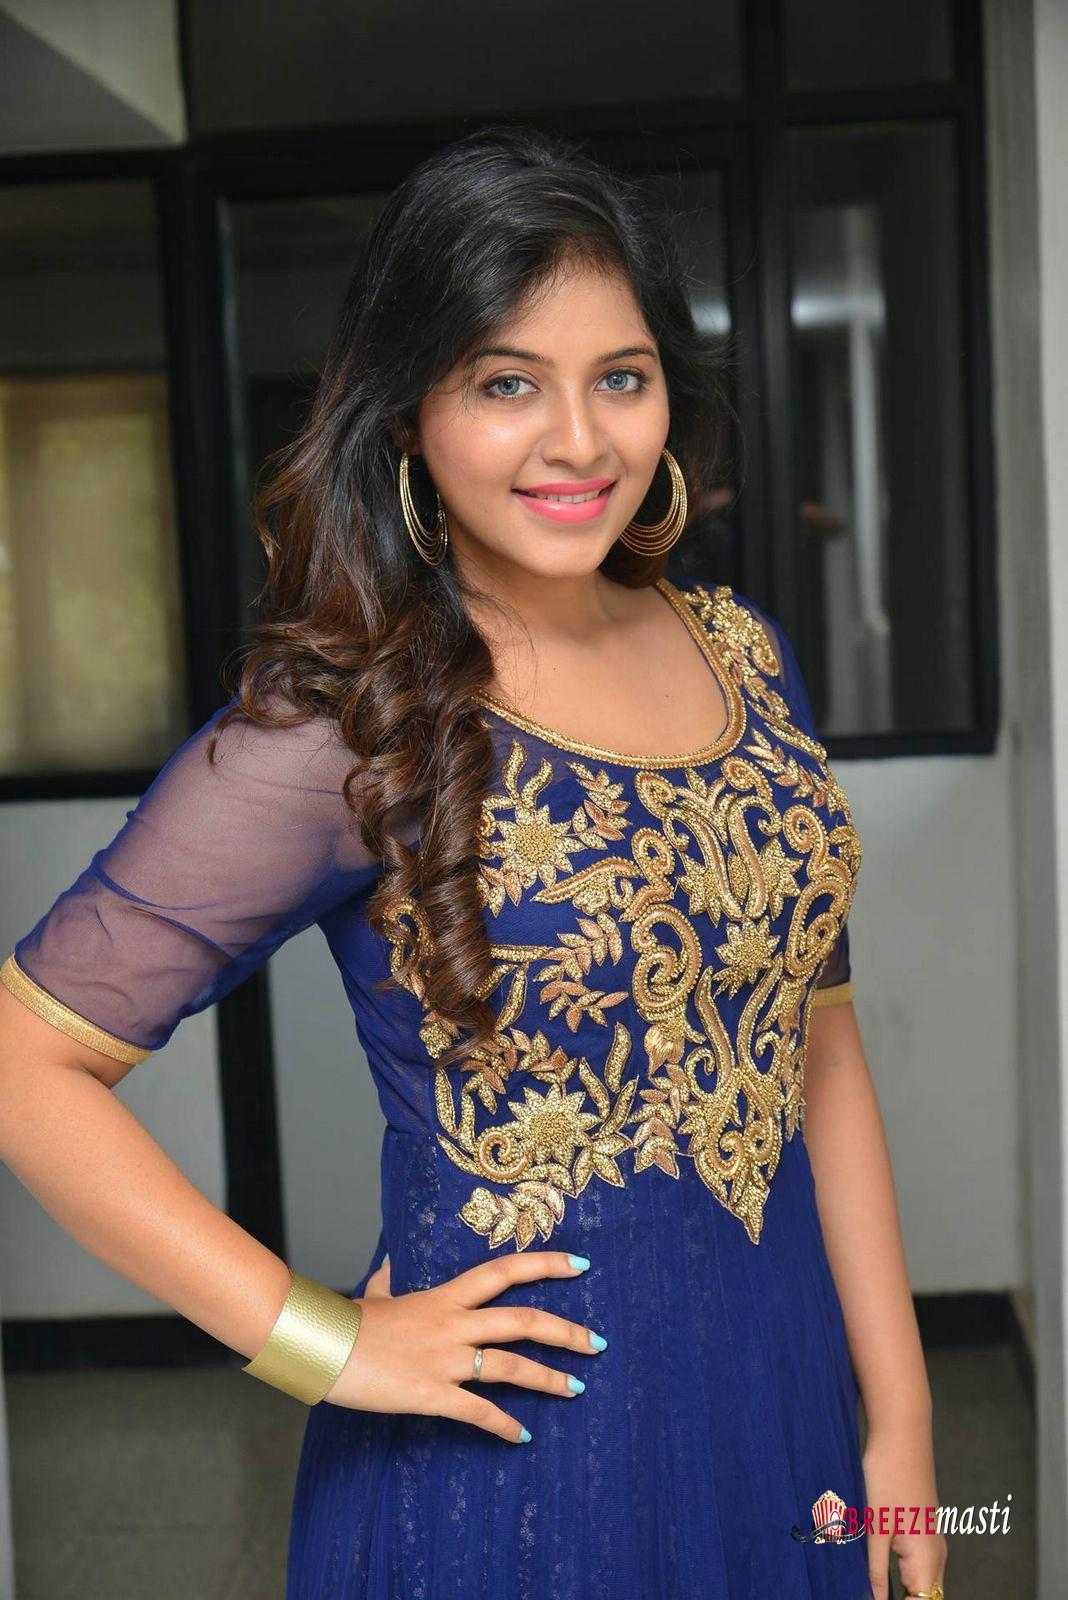 Aanjali south actress hd wallpaper download hd - South indian actress wallpaper ...